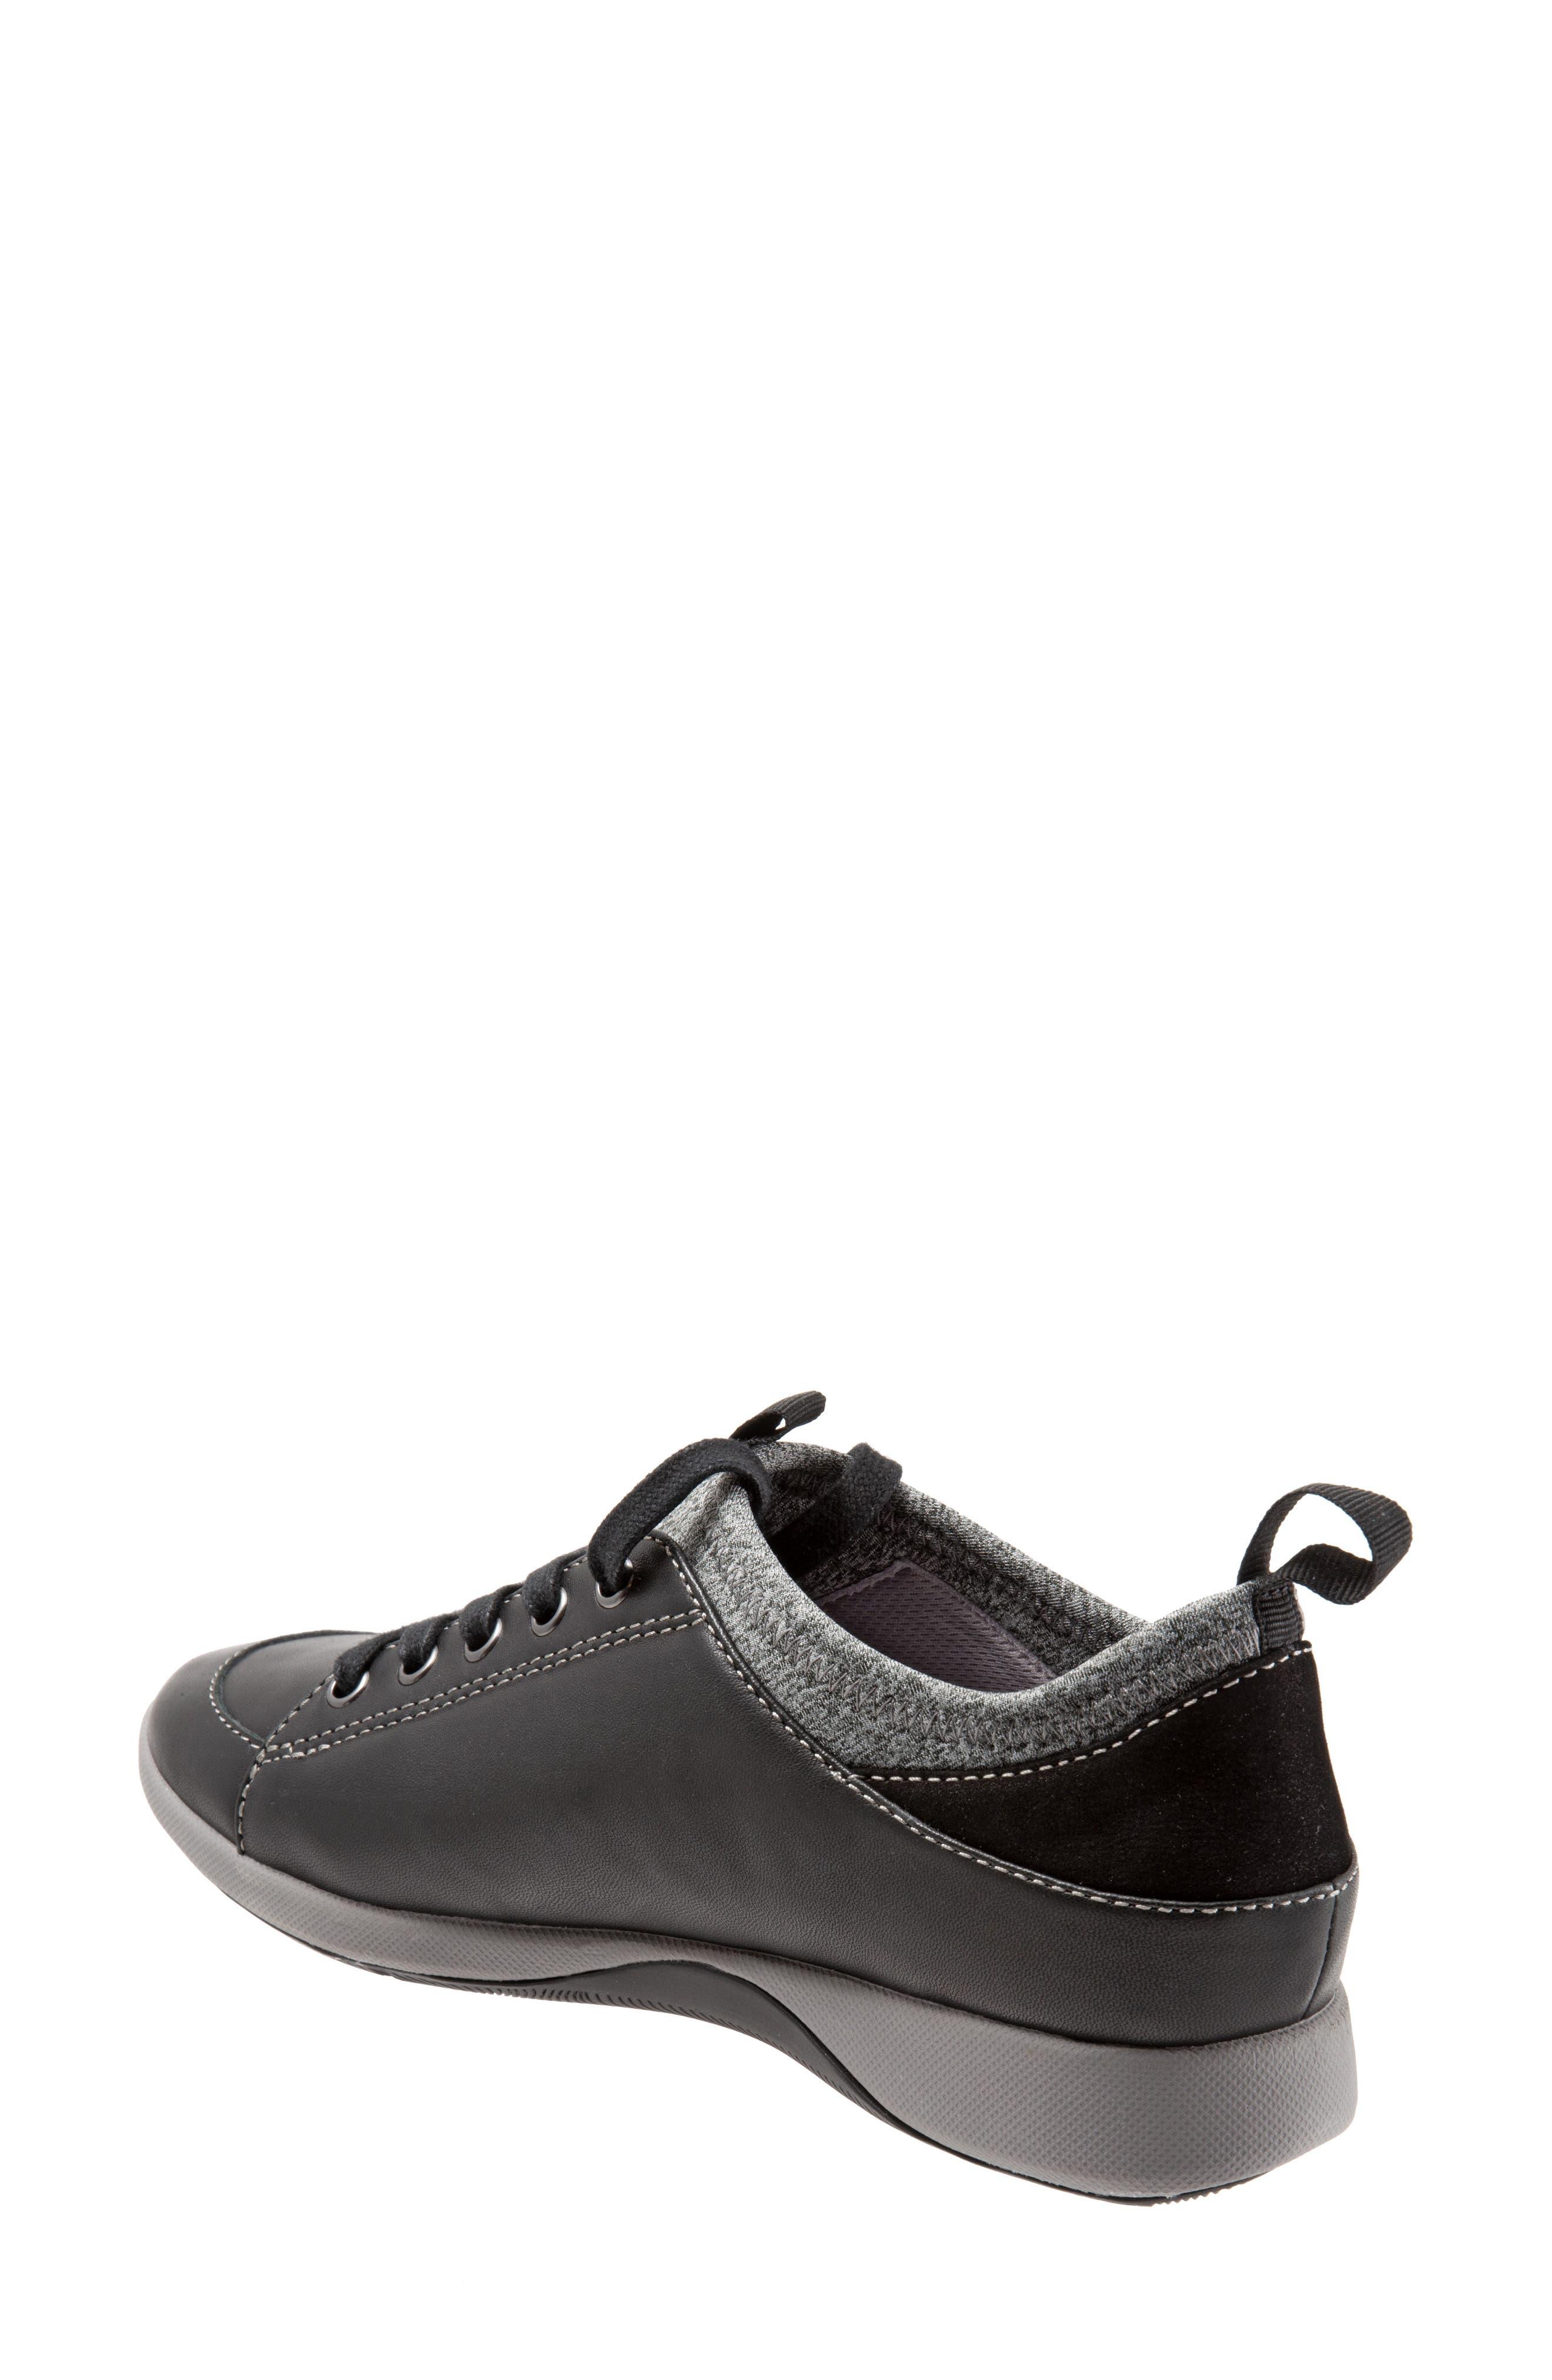 SOFTWALK<SUP>®</SUP>, SAVA Haven Sneaker, Alternate thumbnail 2, color, BLACK/ GREY LEATHER